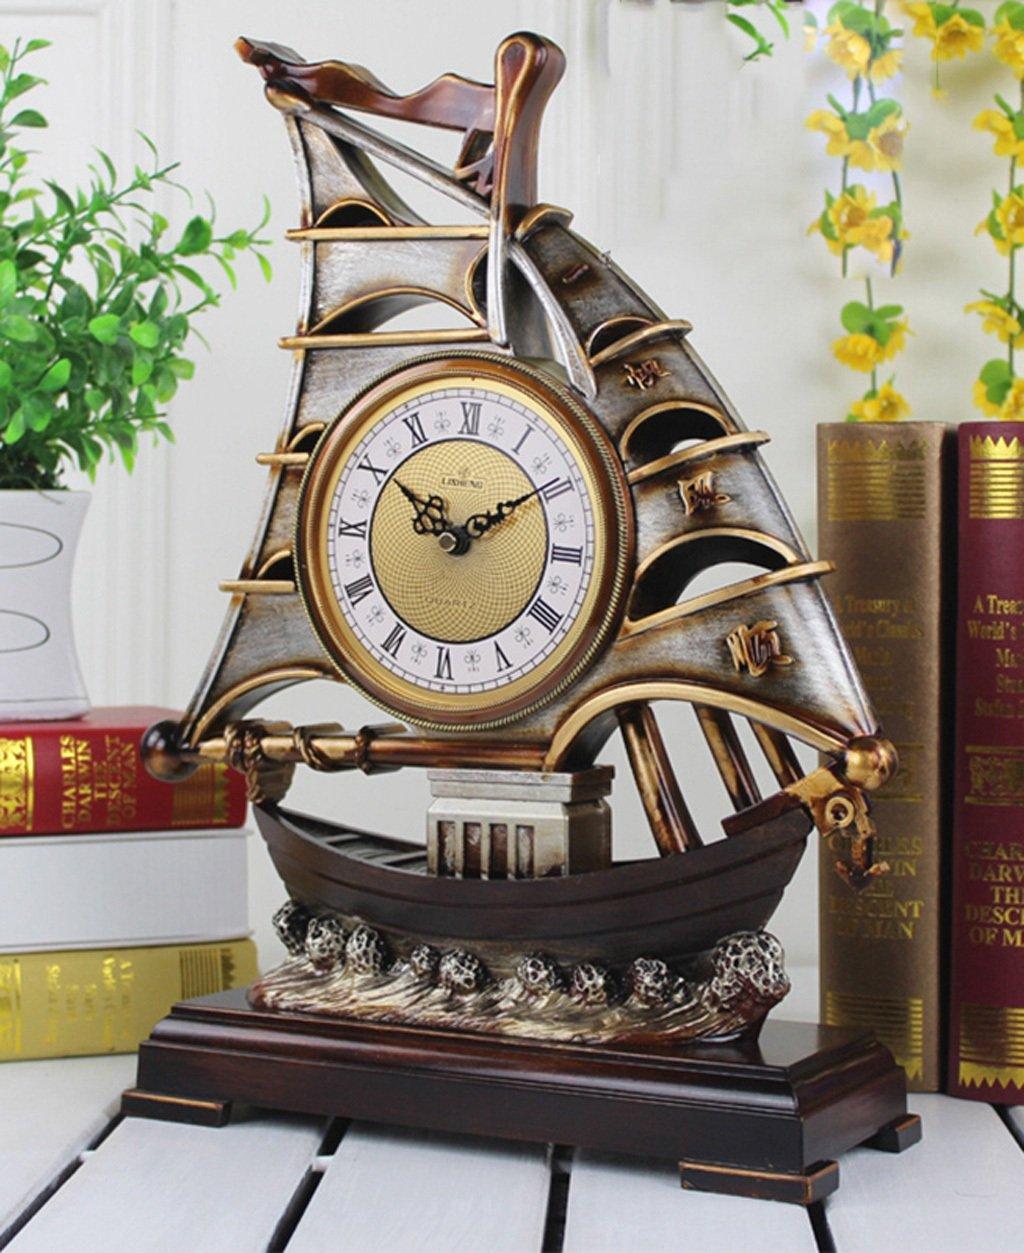 ZHENAI スタイリッシュなシンプルな時計、リビングルーム時計、ガーデンデスククロック ( 色 : A ) B07BXKMNWNA